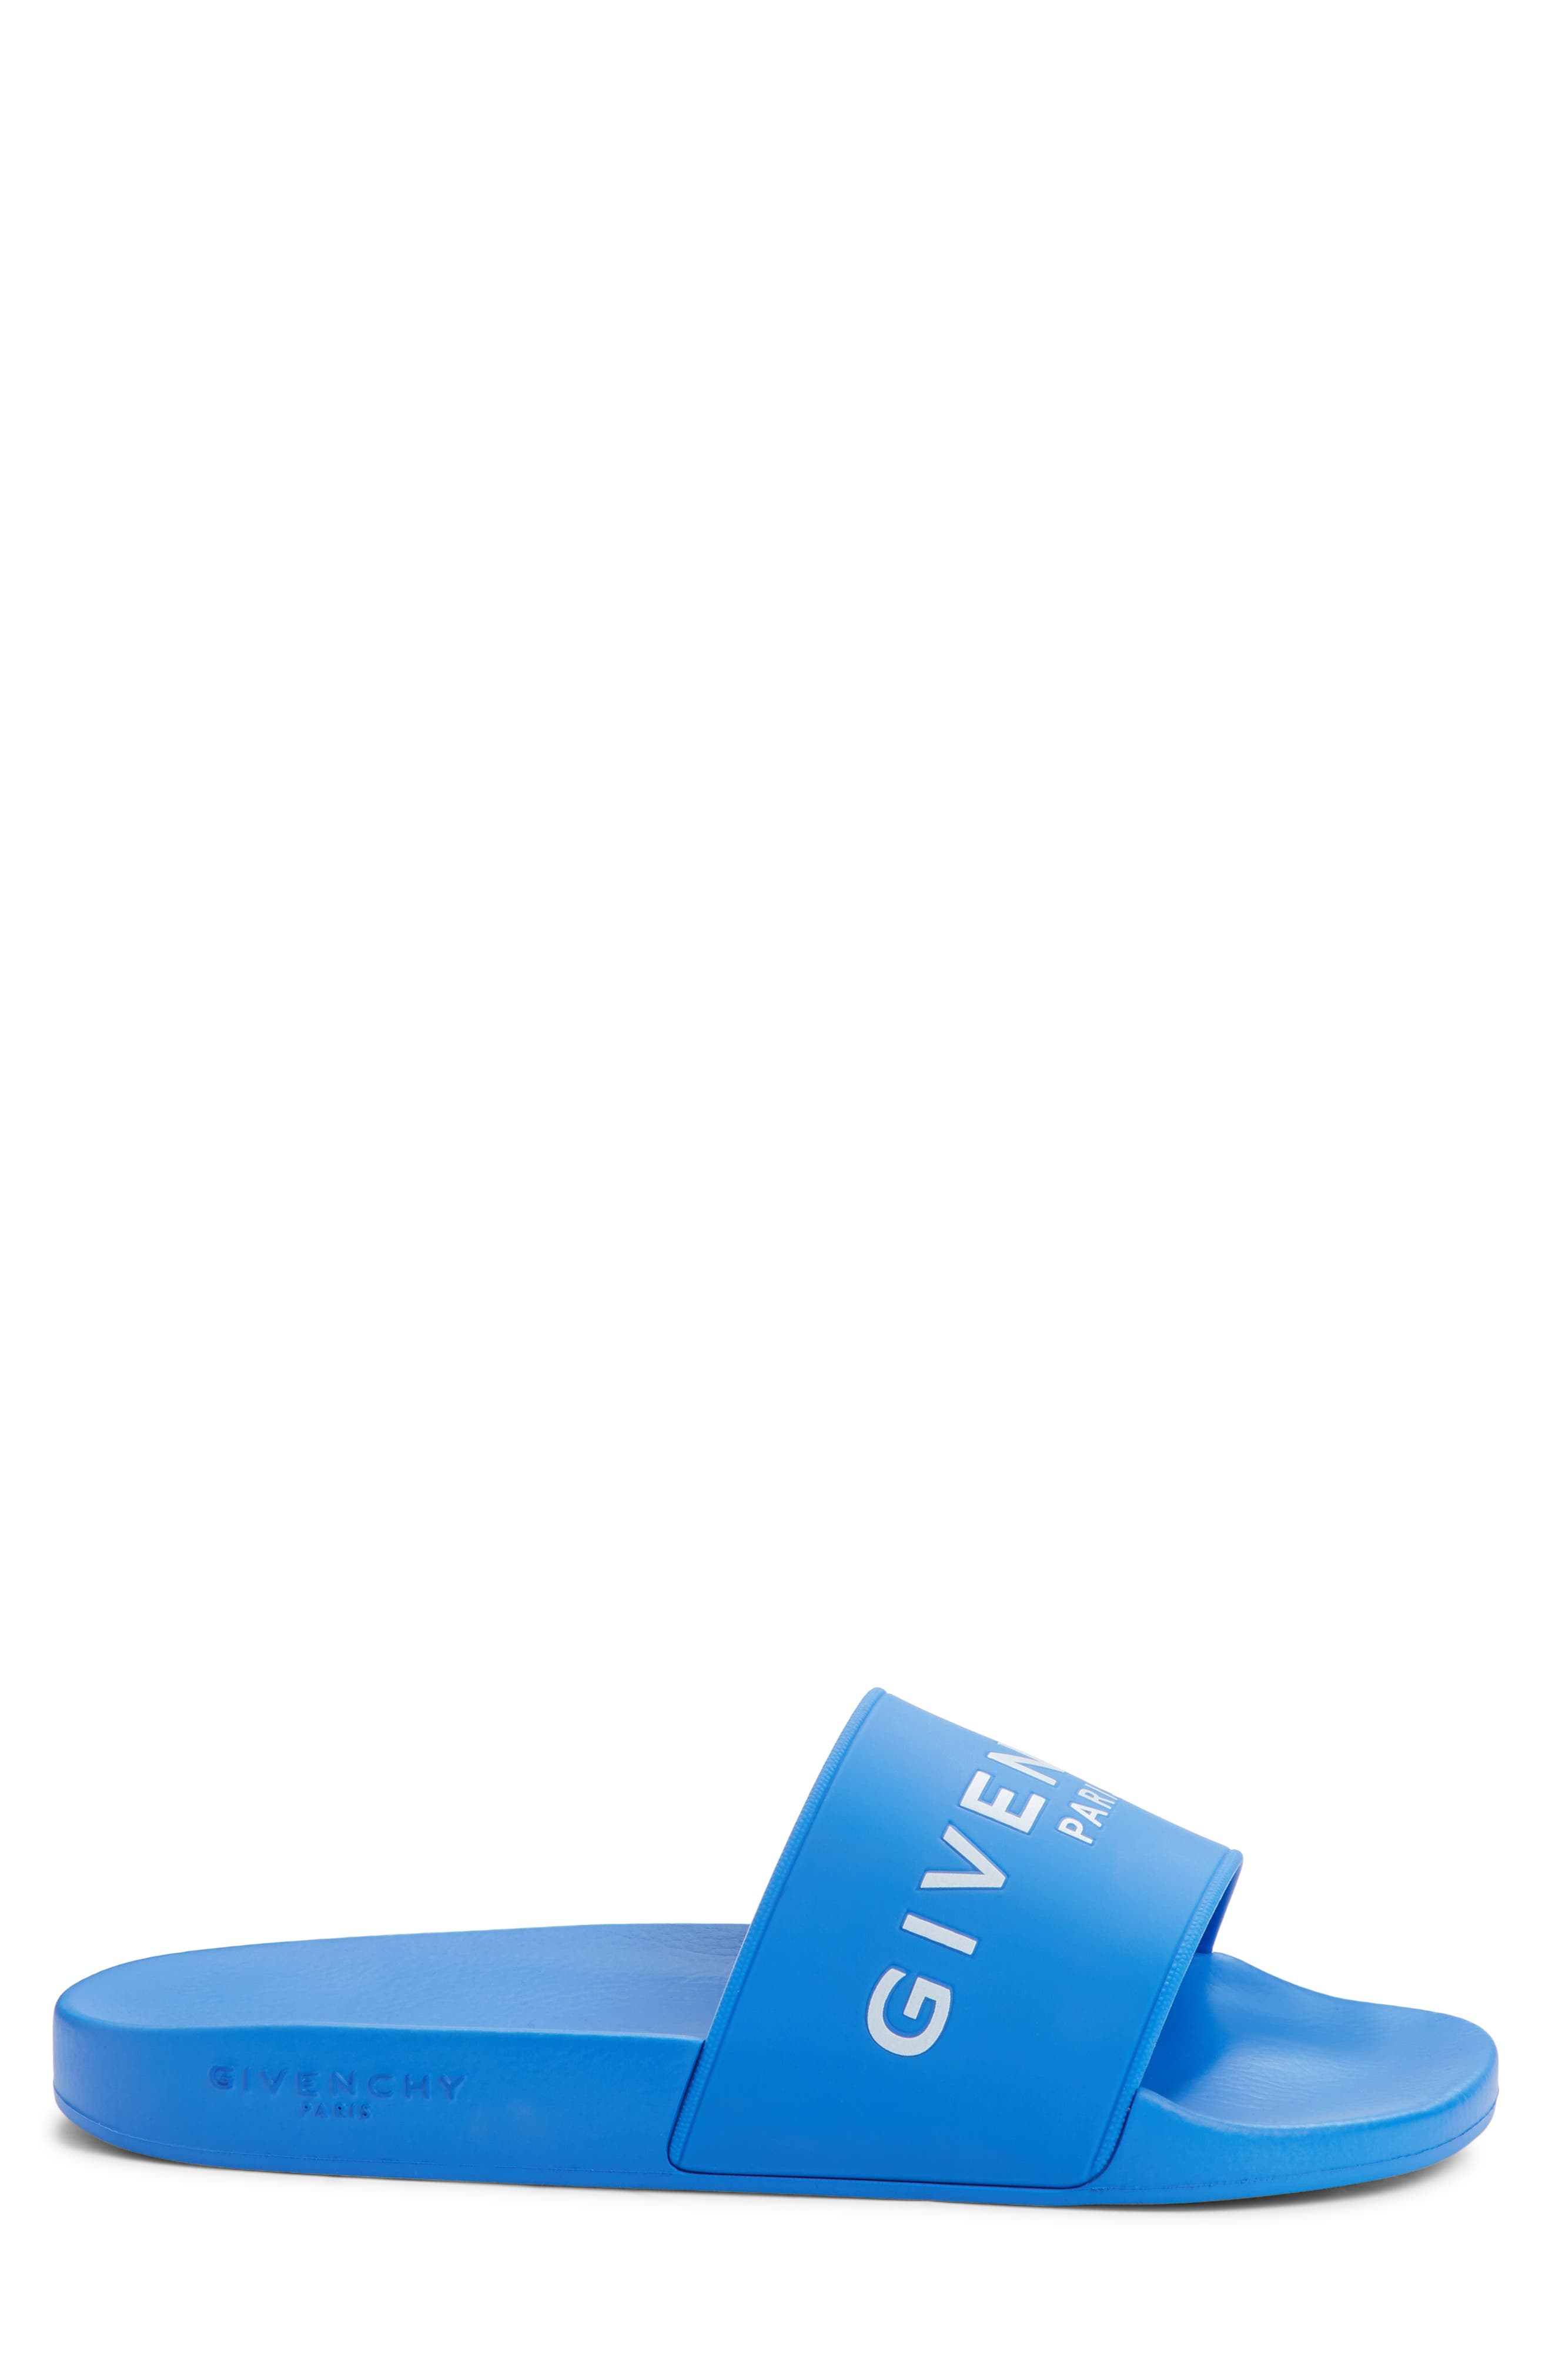 Slide Sandal,                             Alternate thumbnail 3, color,                             ELECTRIC BLUE/ WHITE